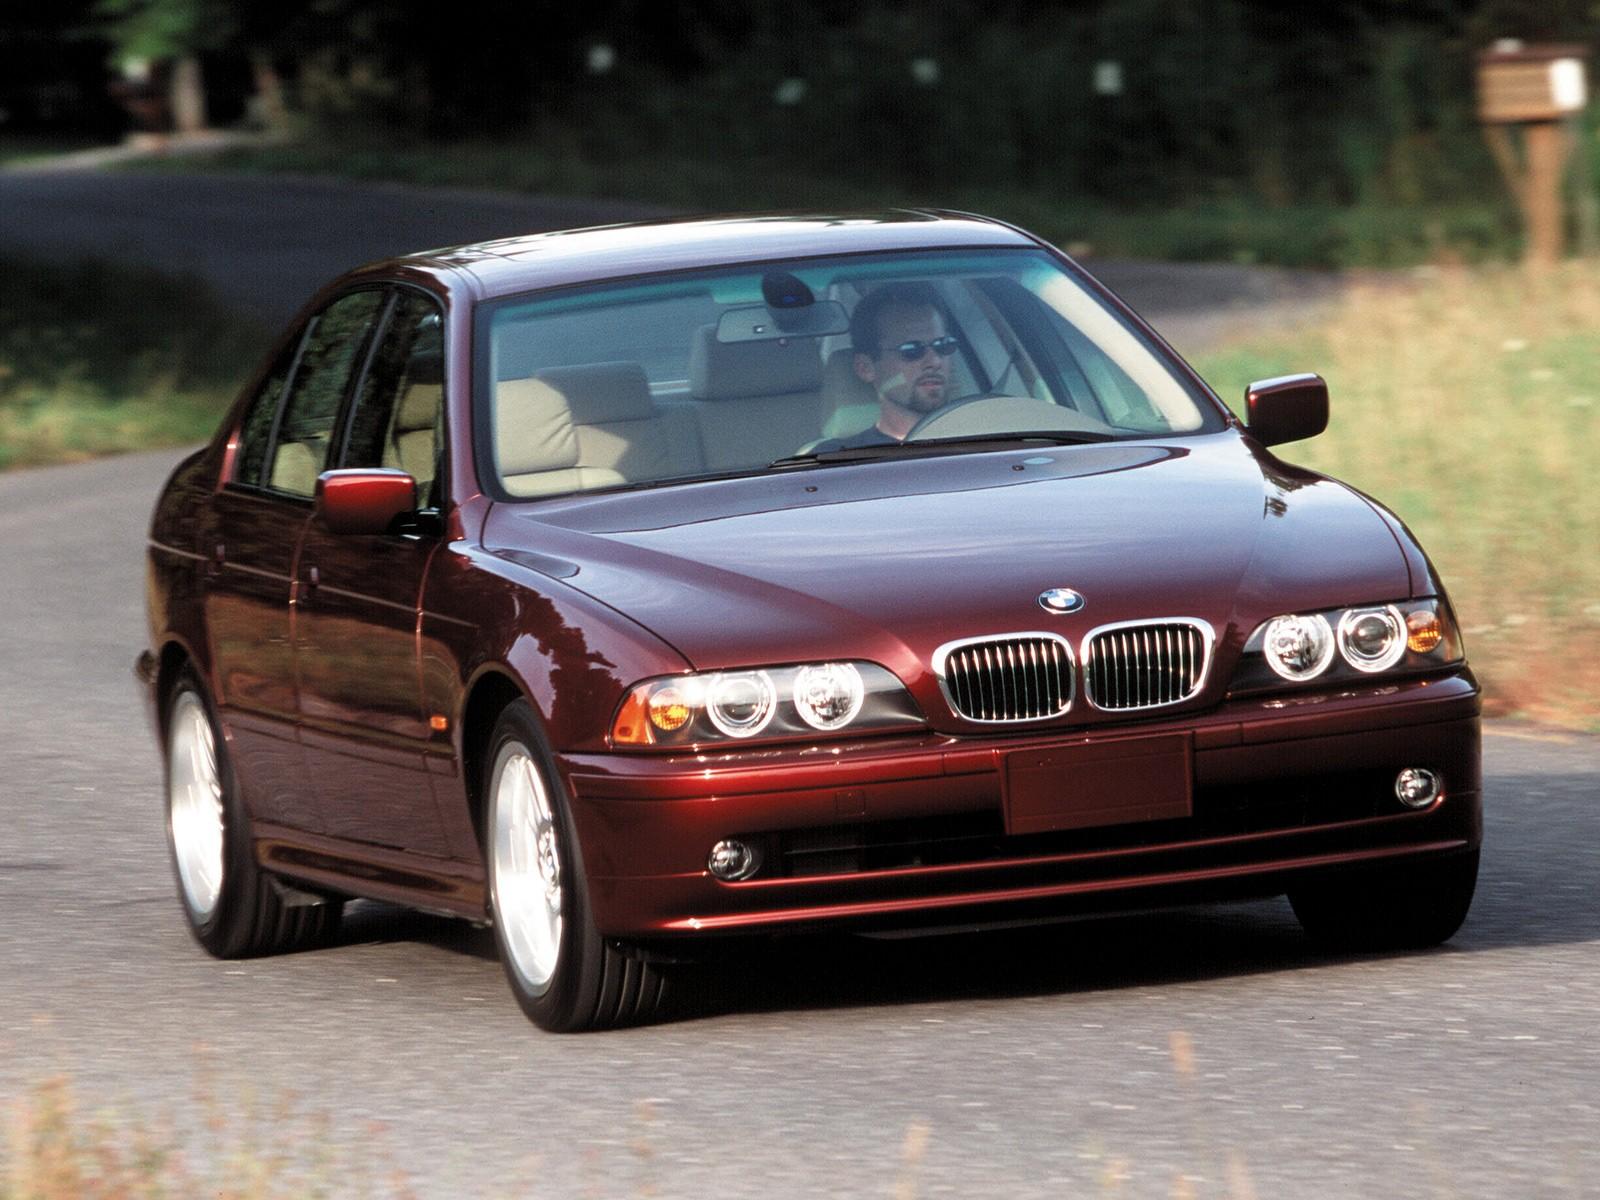 Bmw 5 Series  E39  - 2000  2001  2002  2003